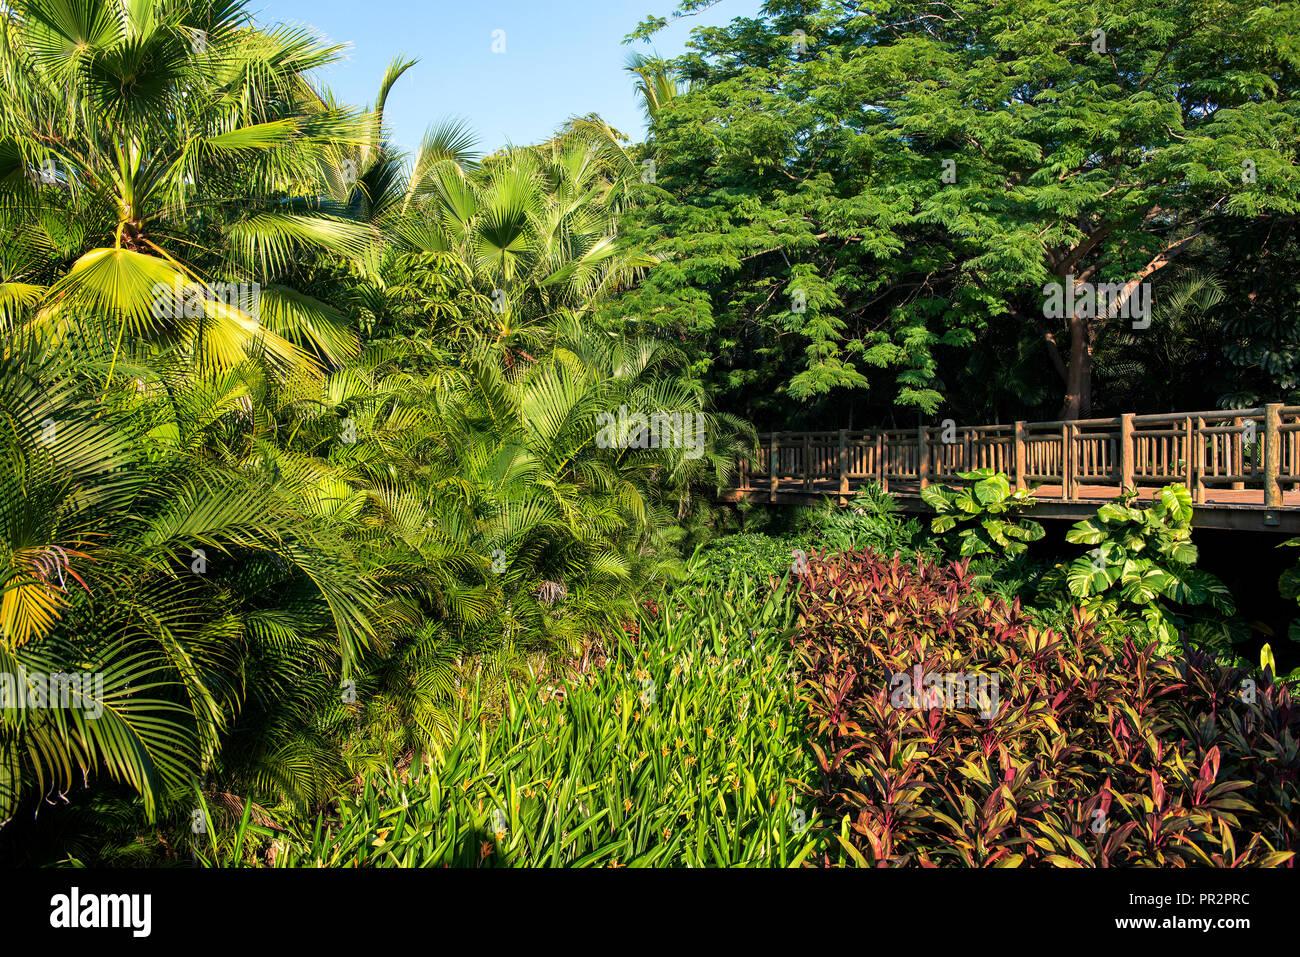 Path through Jungles - Stock Image